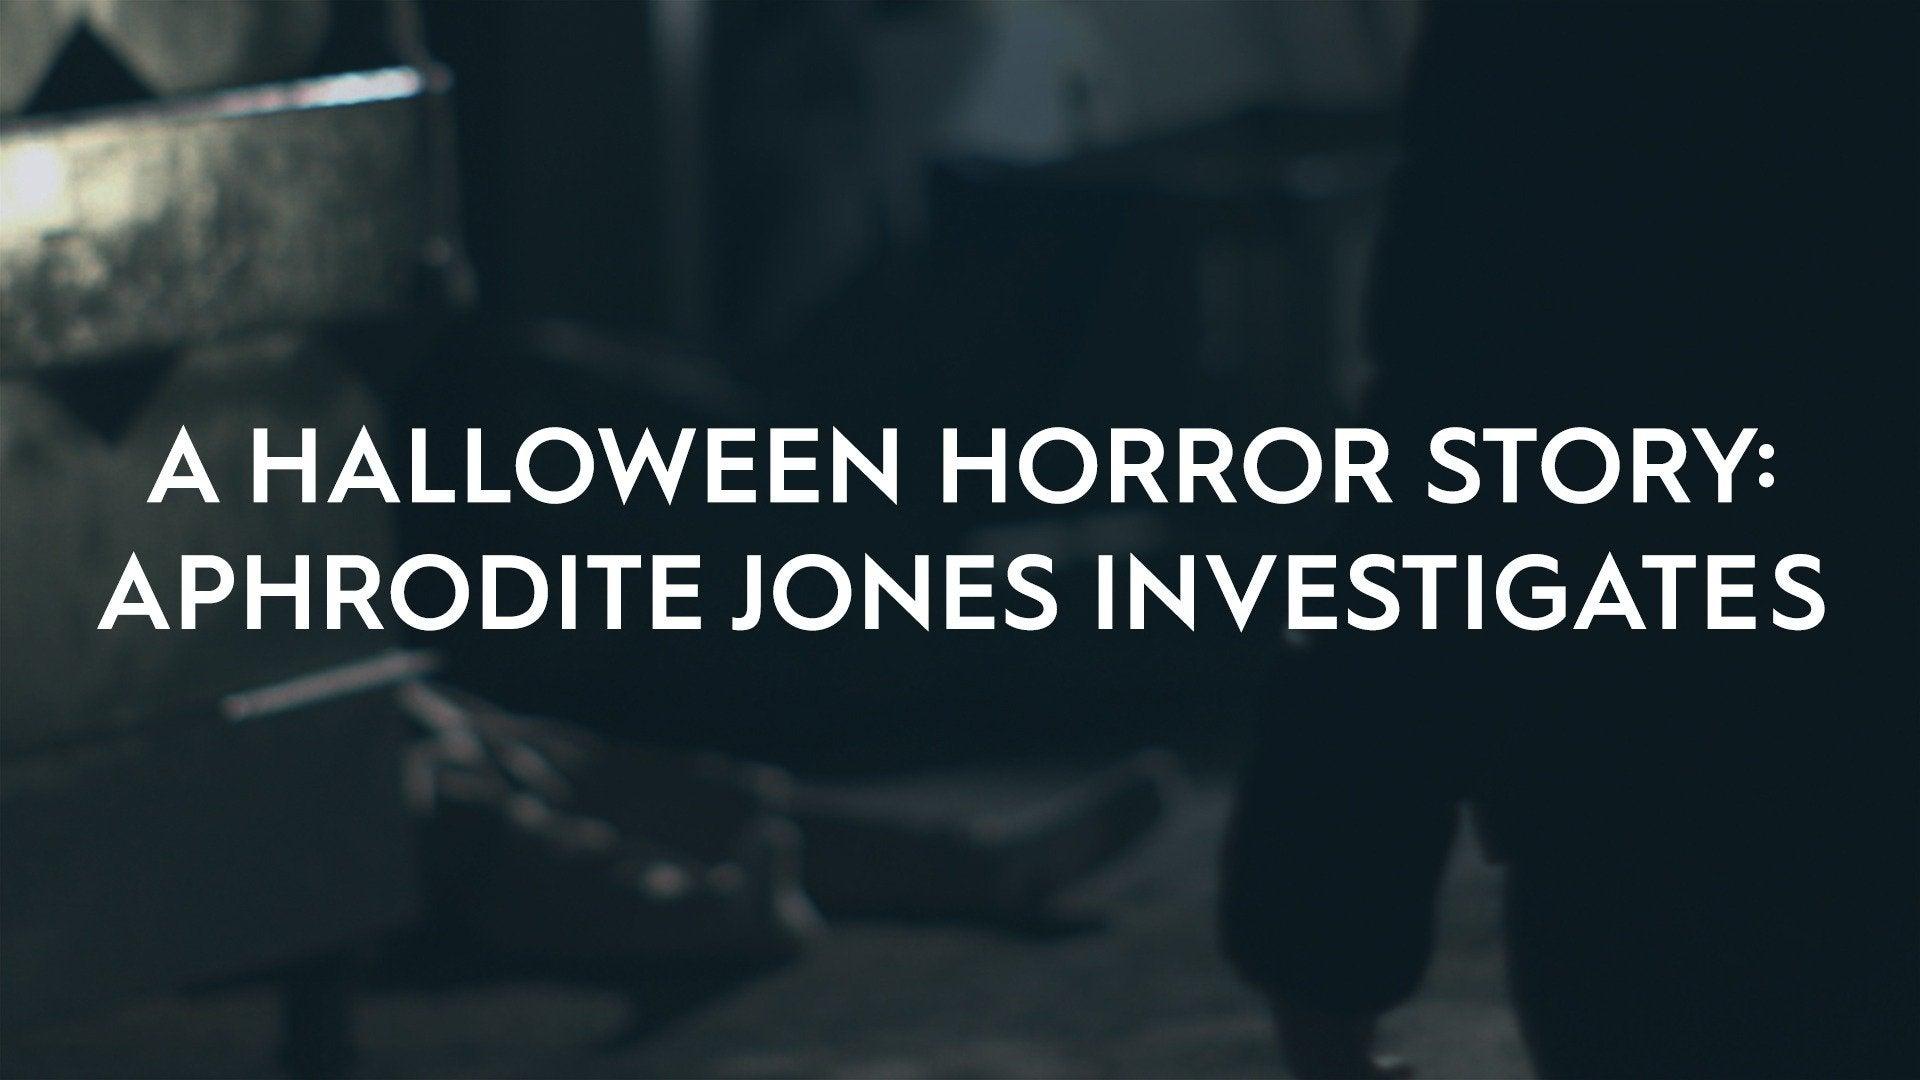 A Halloween Horror Story: Aphrodite Jones Investigates